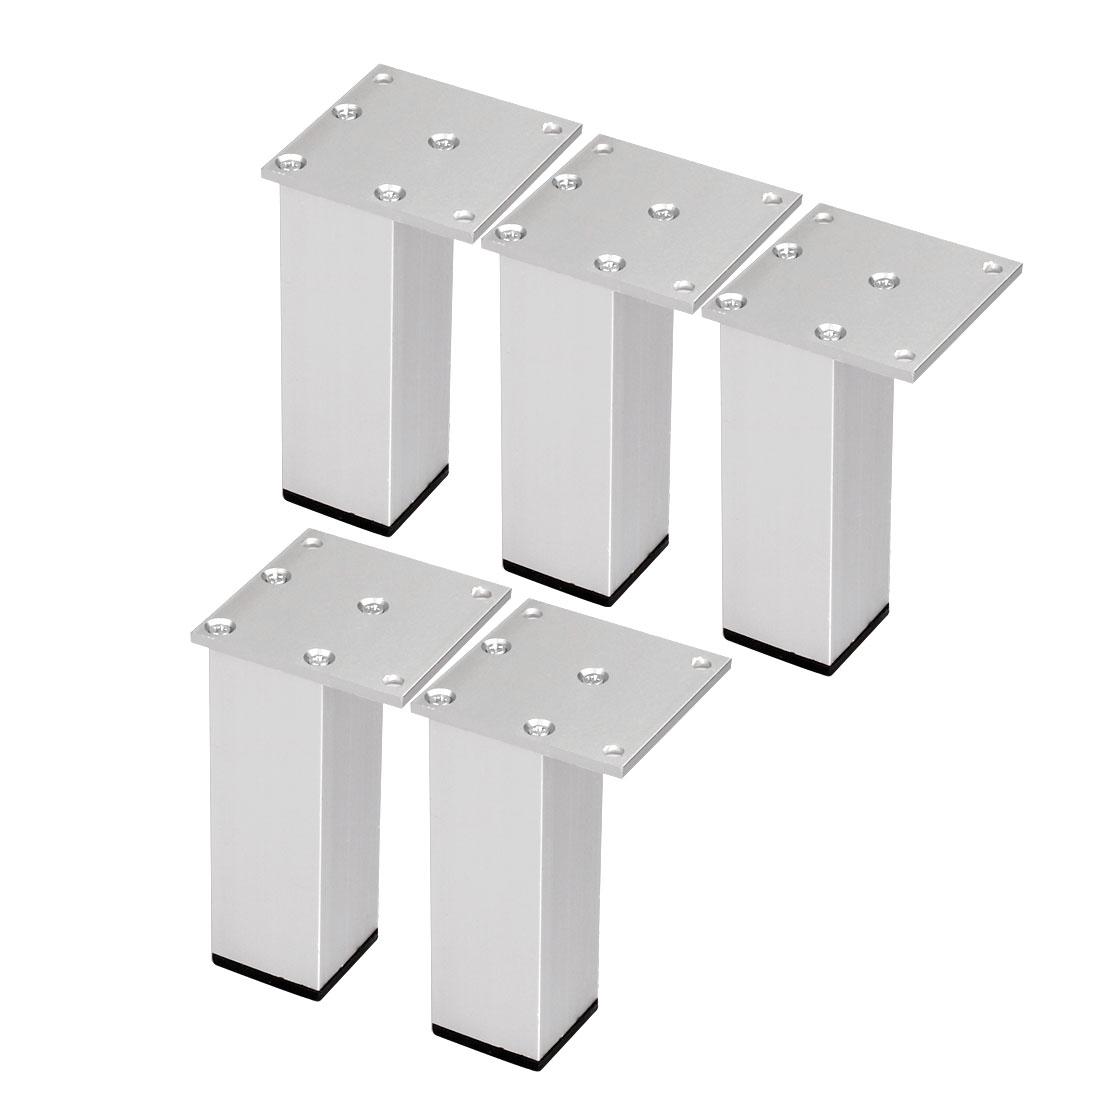 "4"" Furniture Legs Aluminium Alloy Table Feet Replacement Height Adjuster 5pcs"